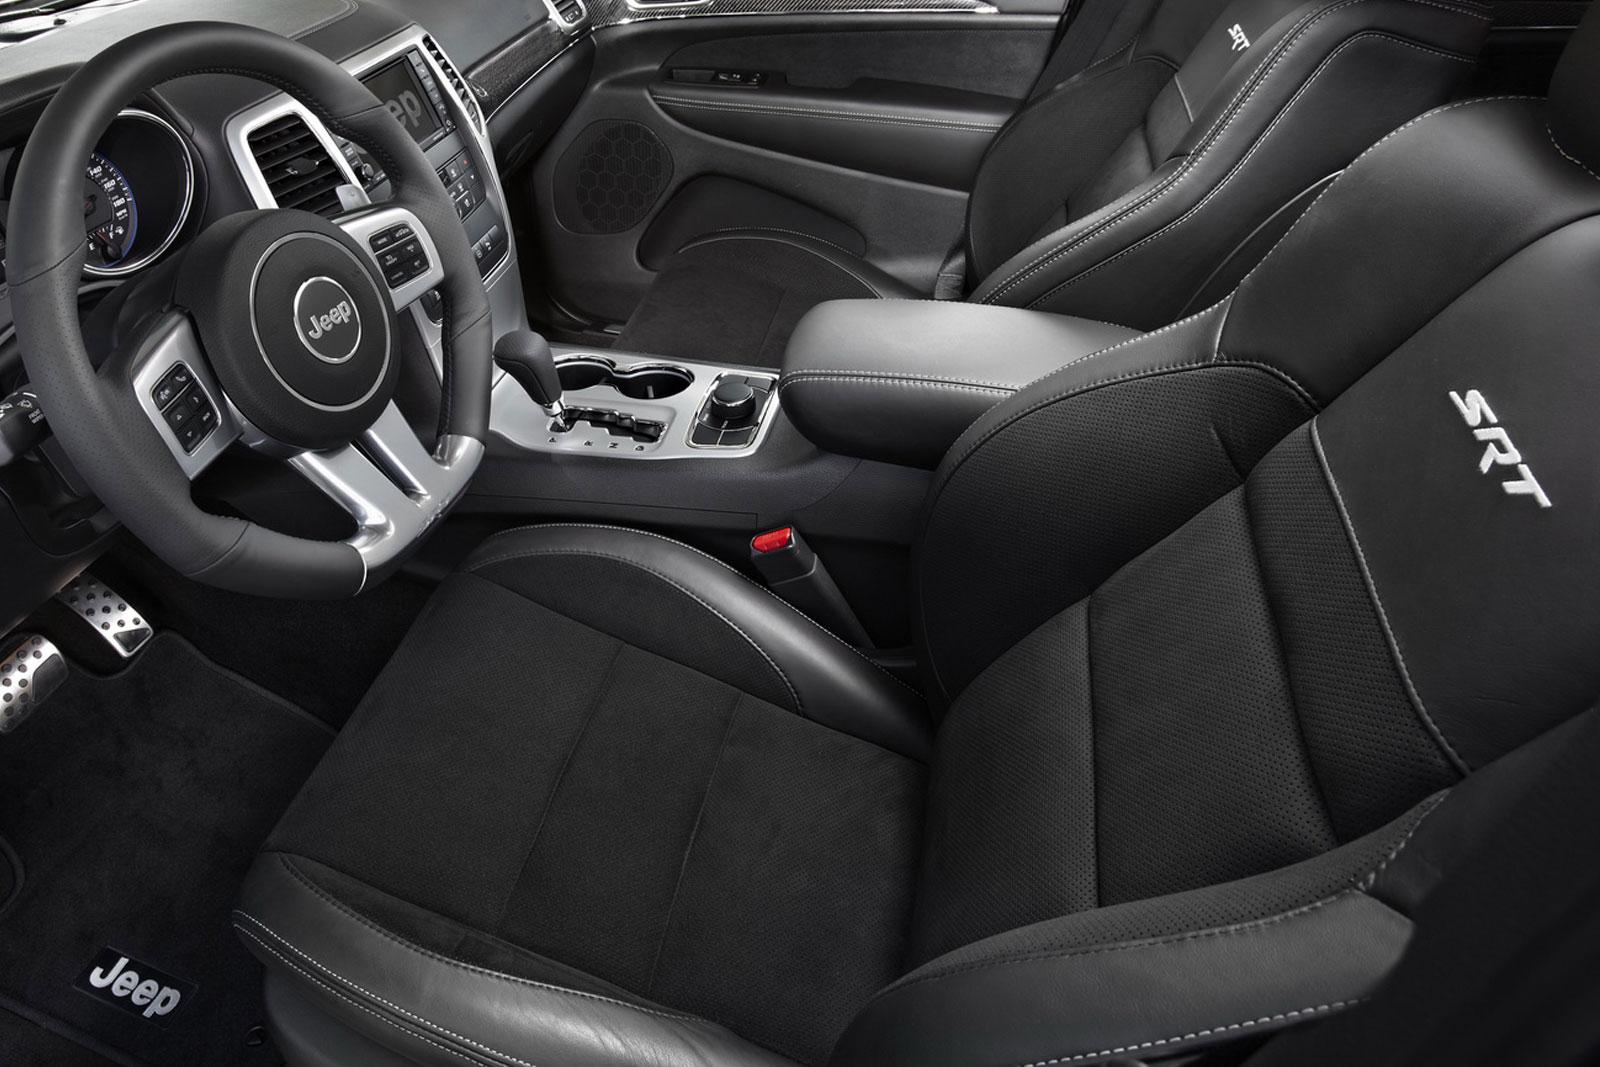 2015 Lexus GS Custom Dash Kits